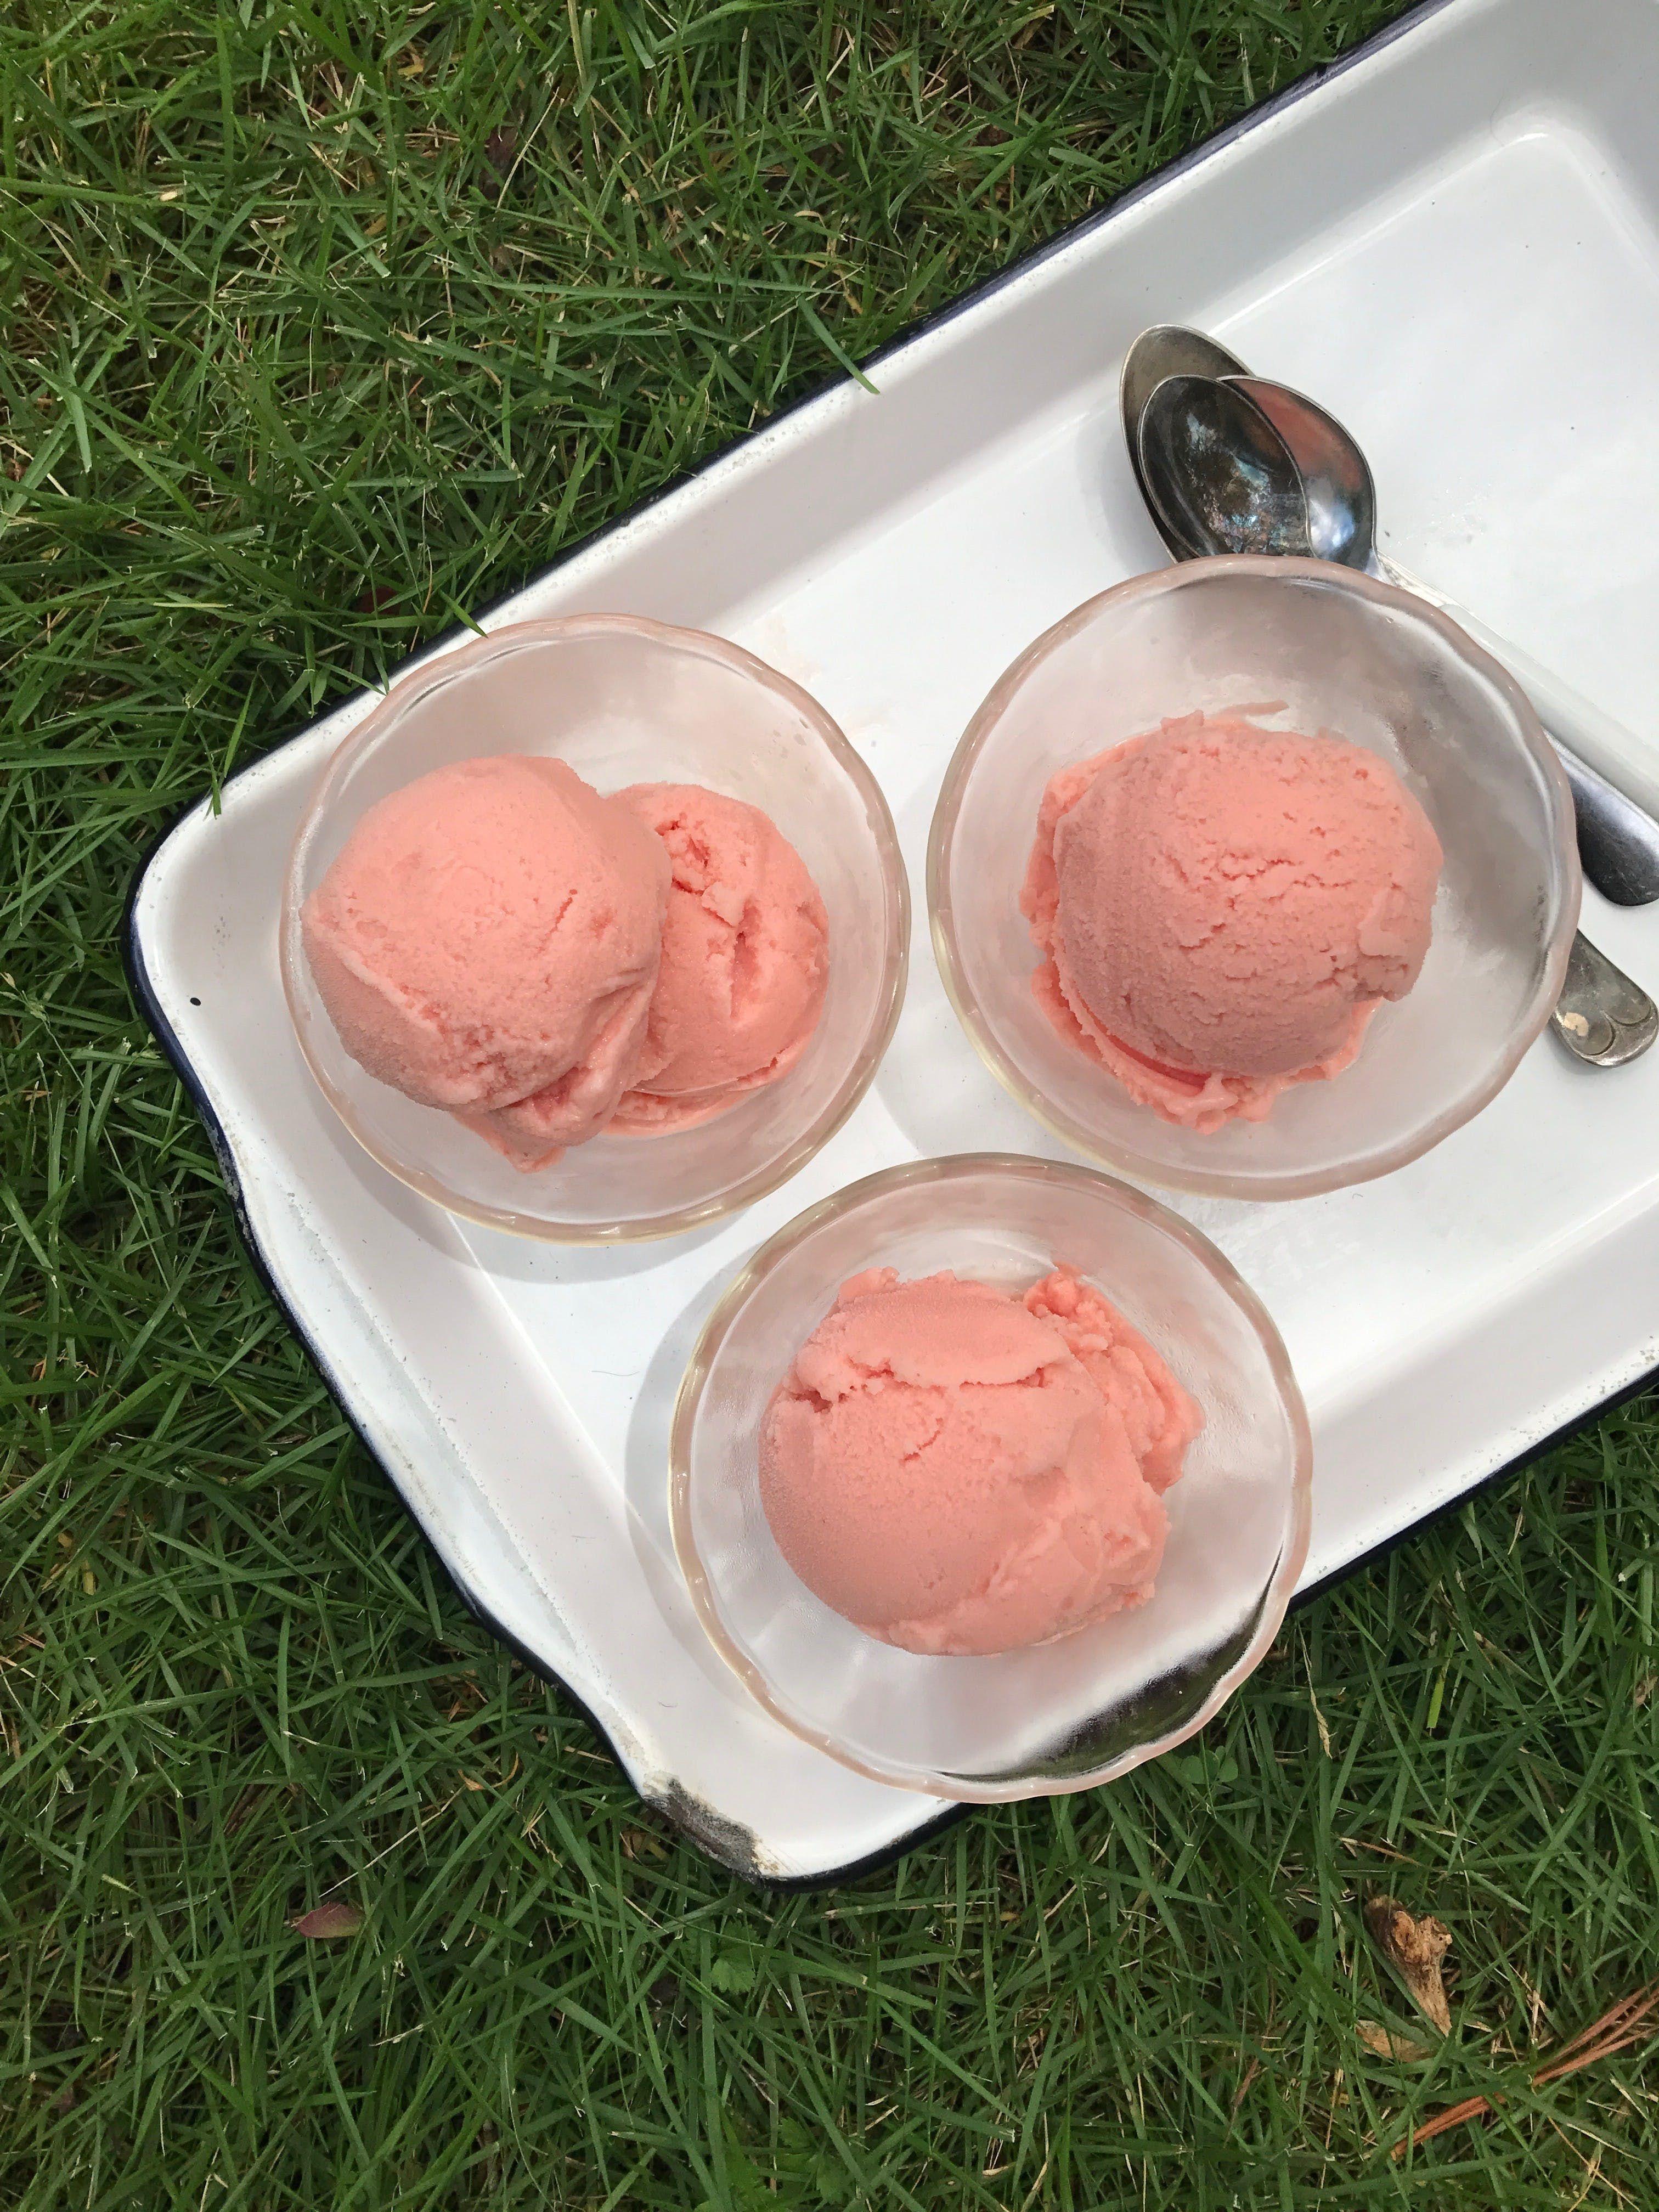 2-Ingredient Watermelon Sherbet